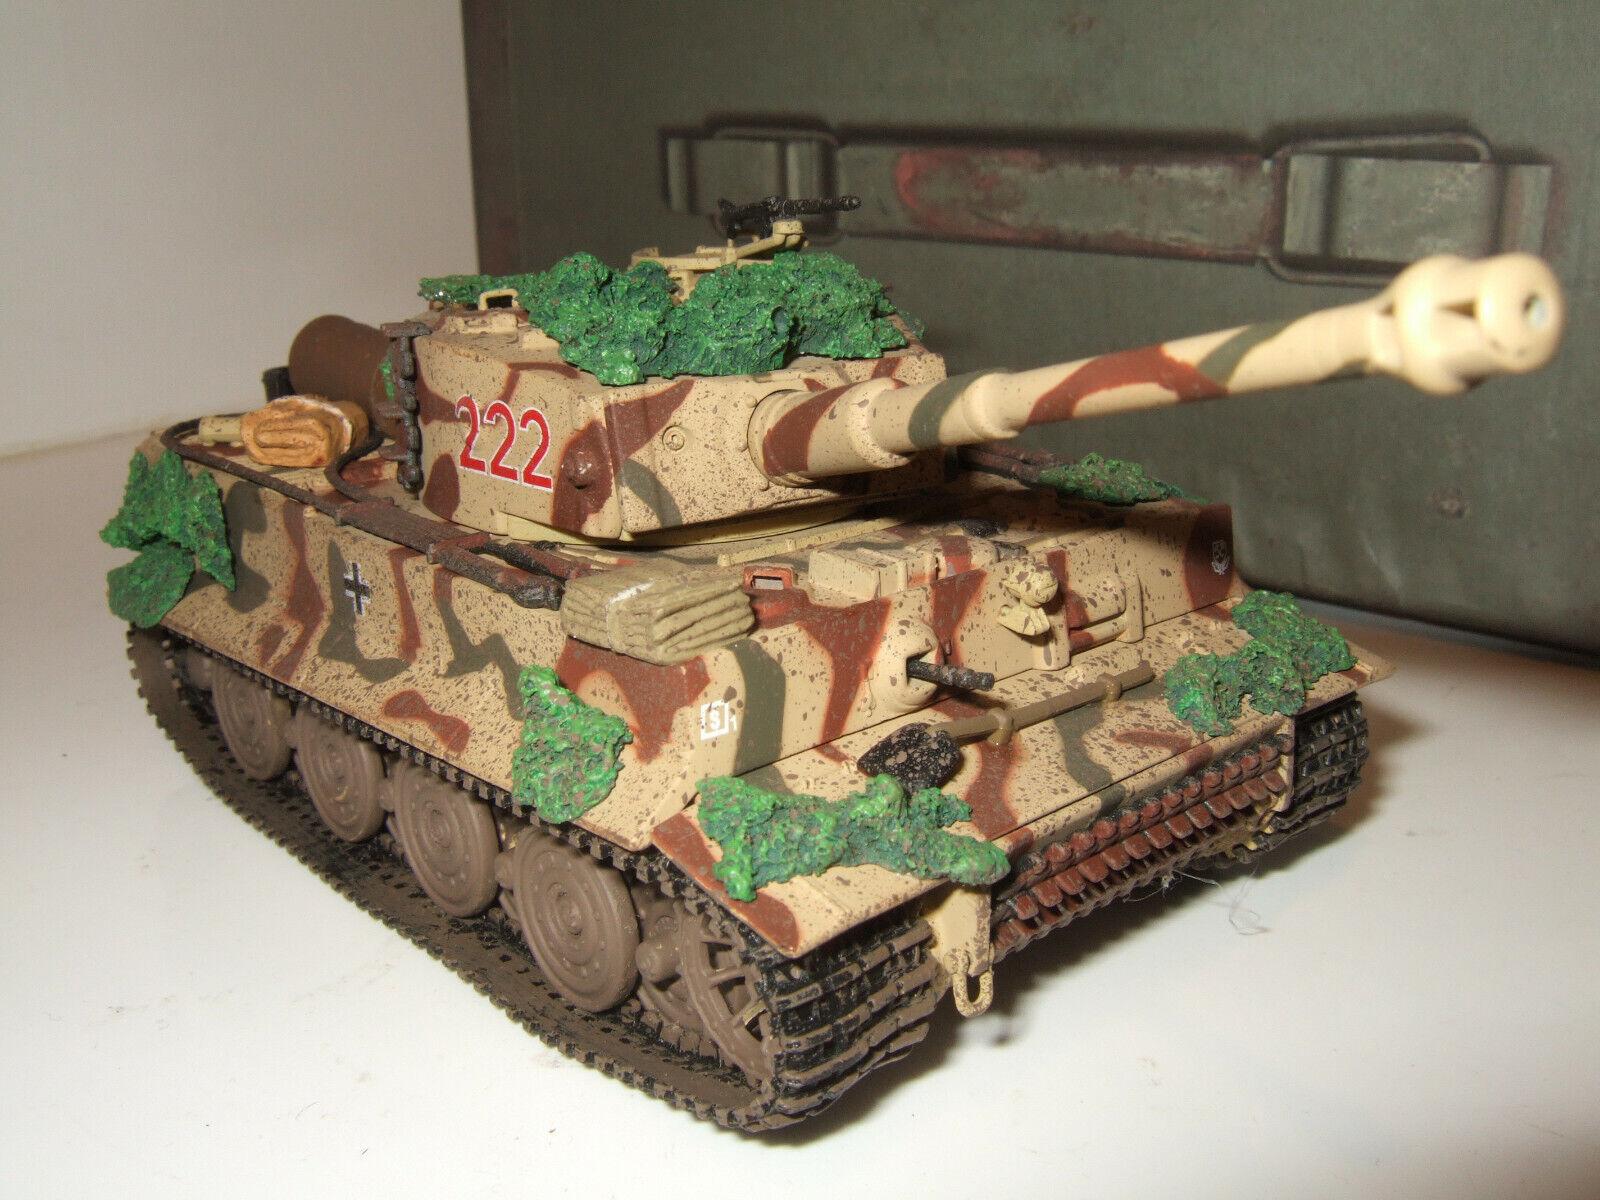 Corgi CC60504 rara splata Kurt Sowa's Tiger 1 Ausf. e, SS Panzers en escala 1 50.